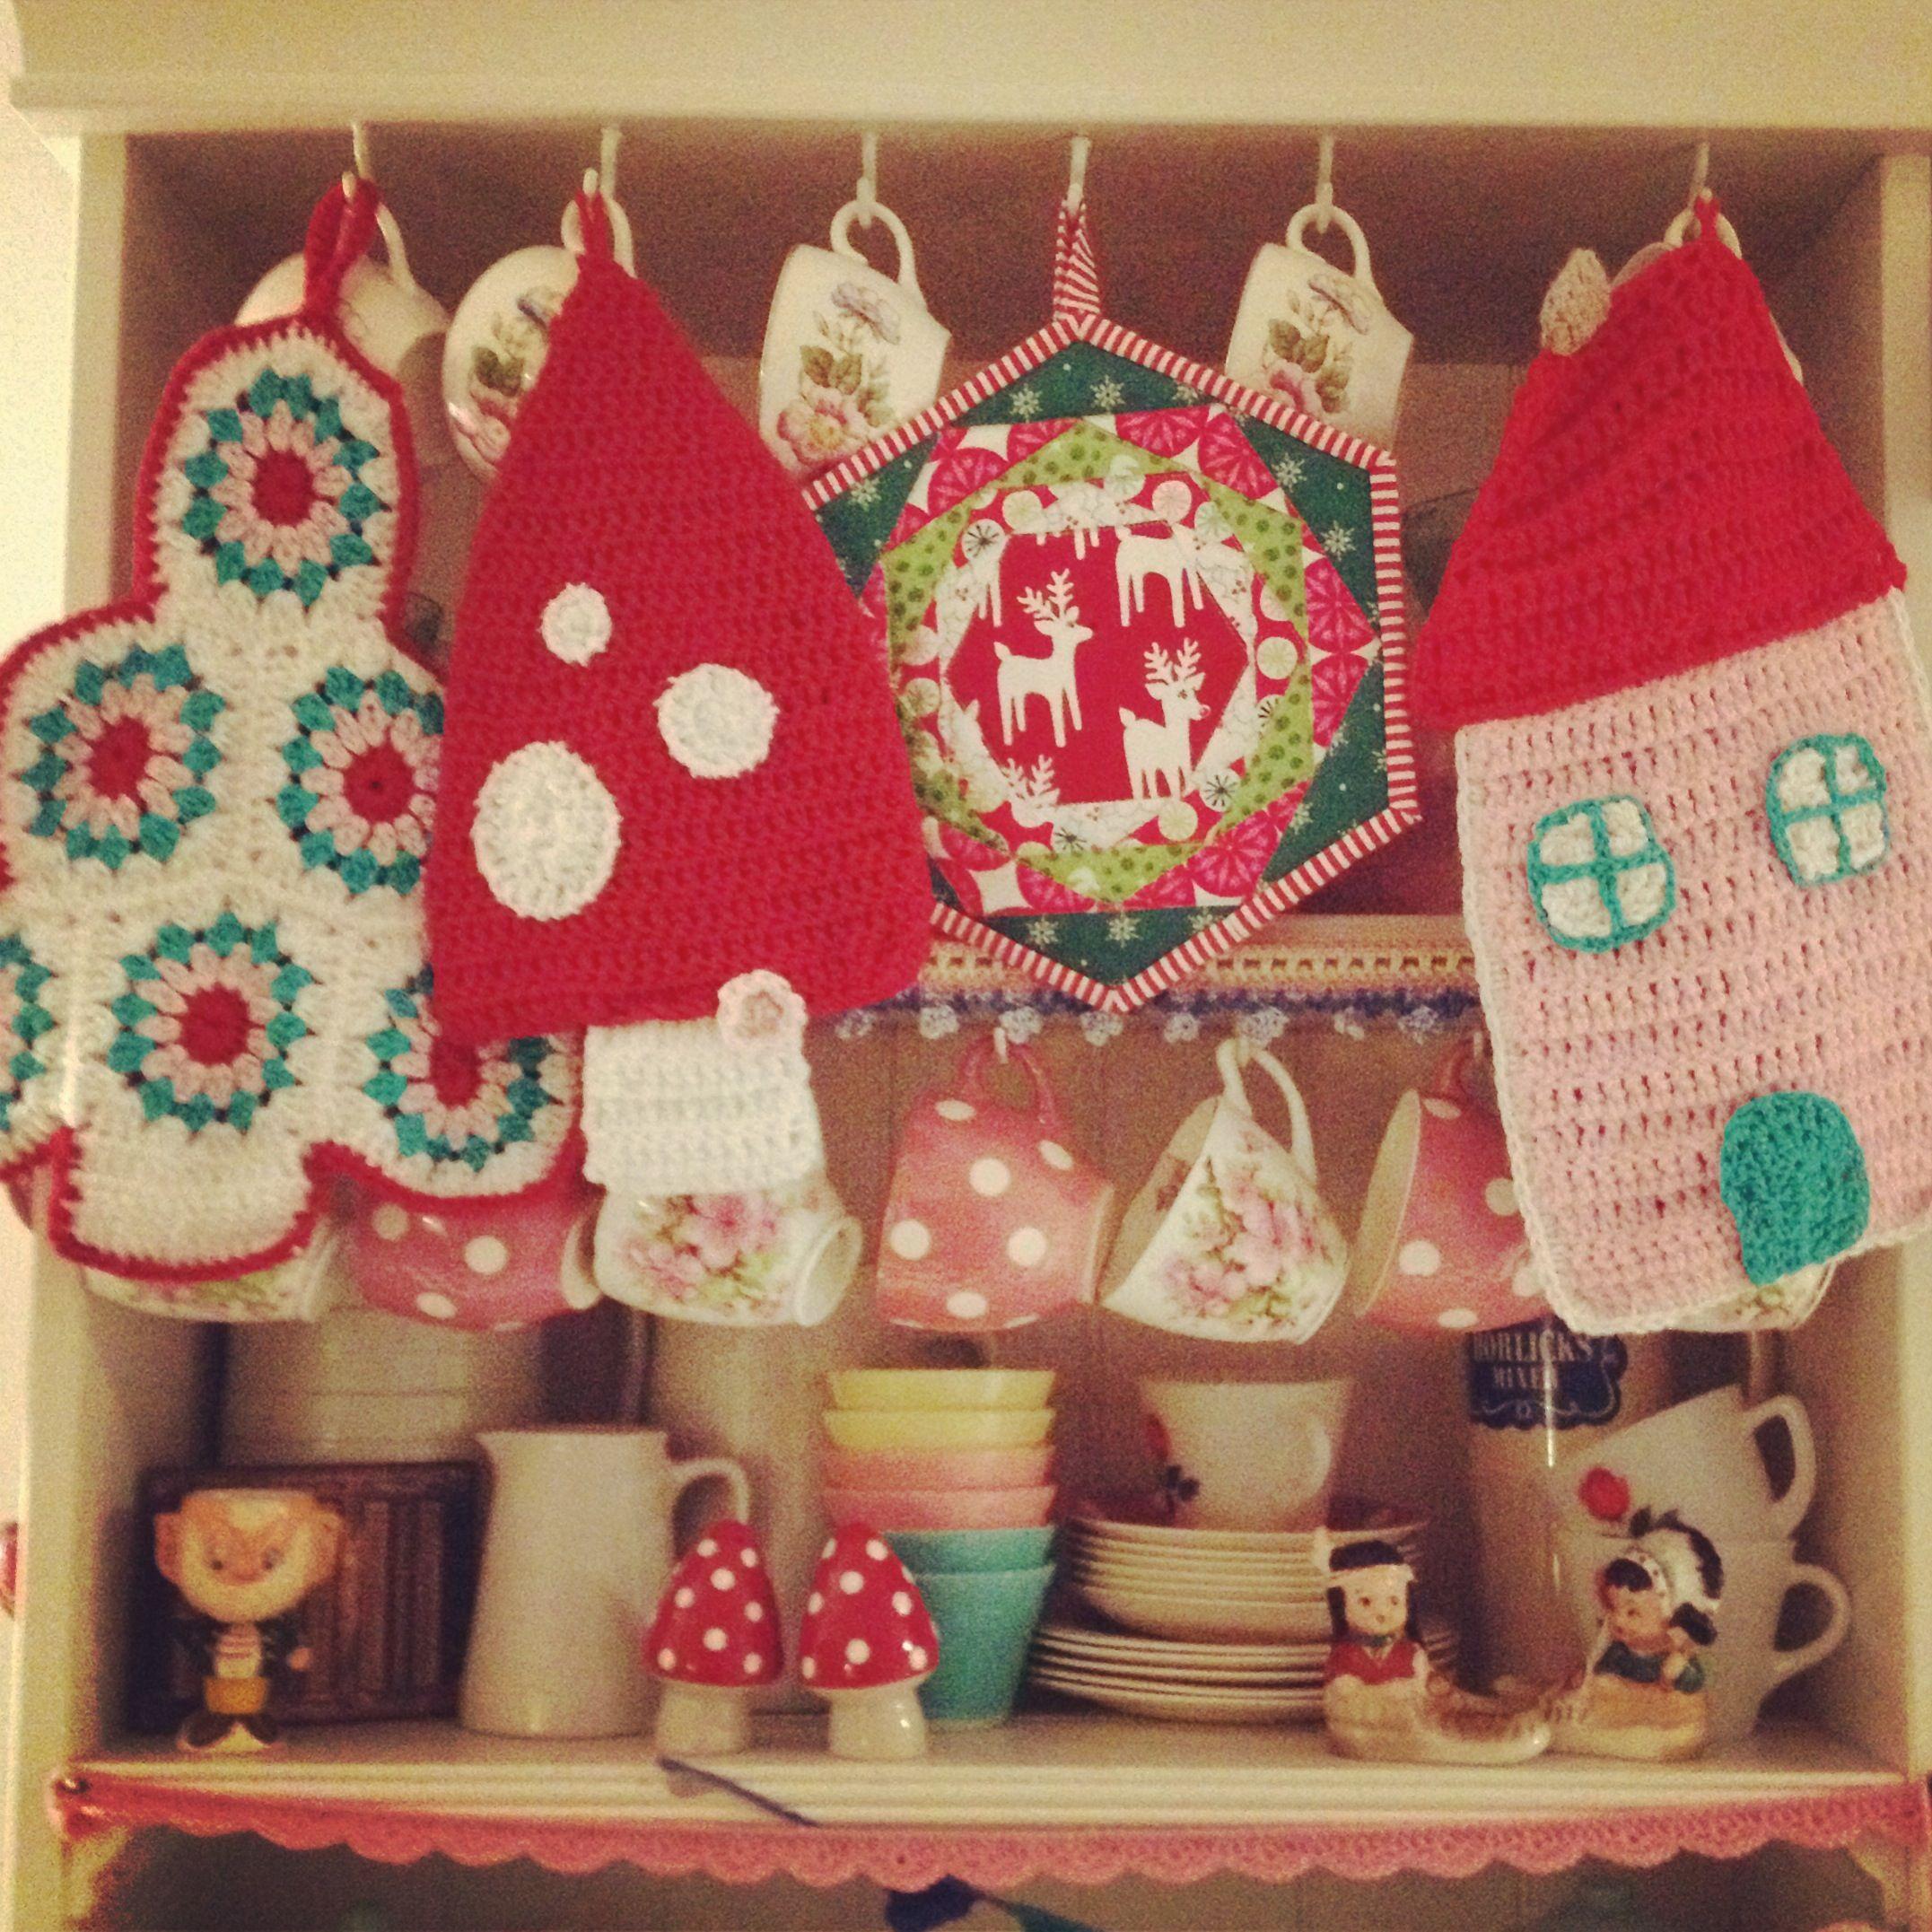 madebymim crochet potholders and a @Helen Palmer Palmer Palmer P  beautiful quilted potholder on my dresser